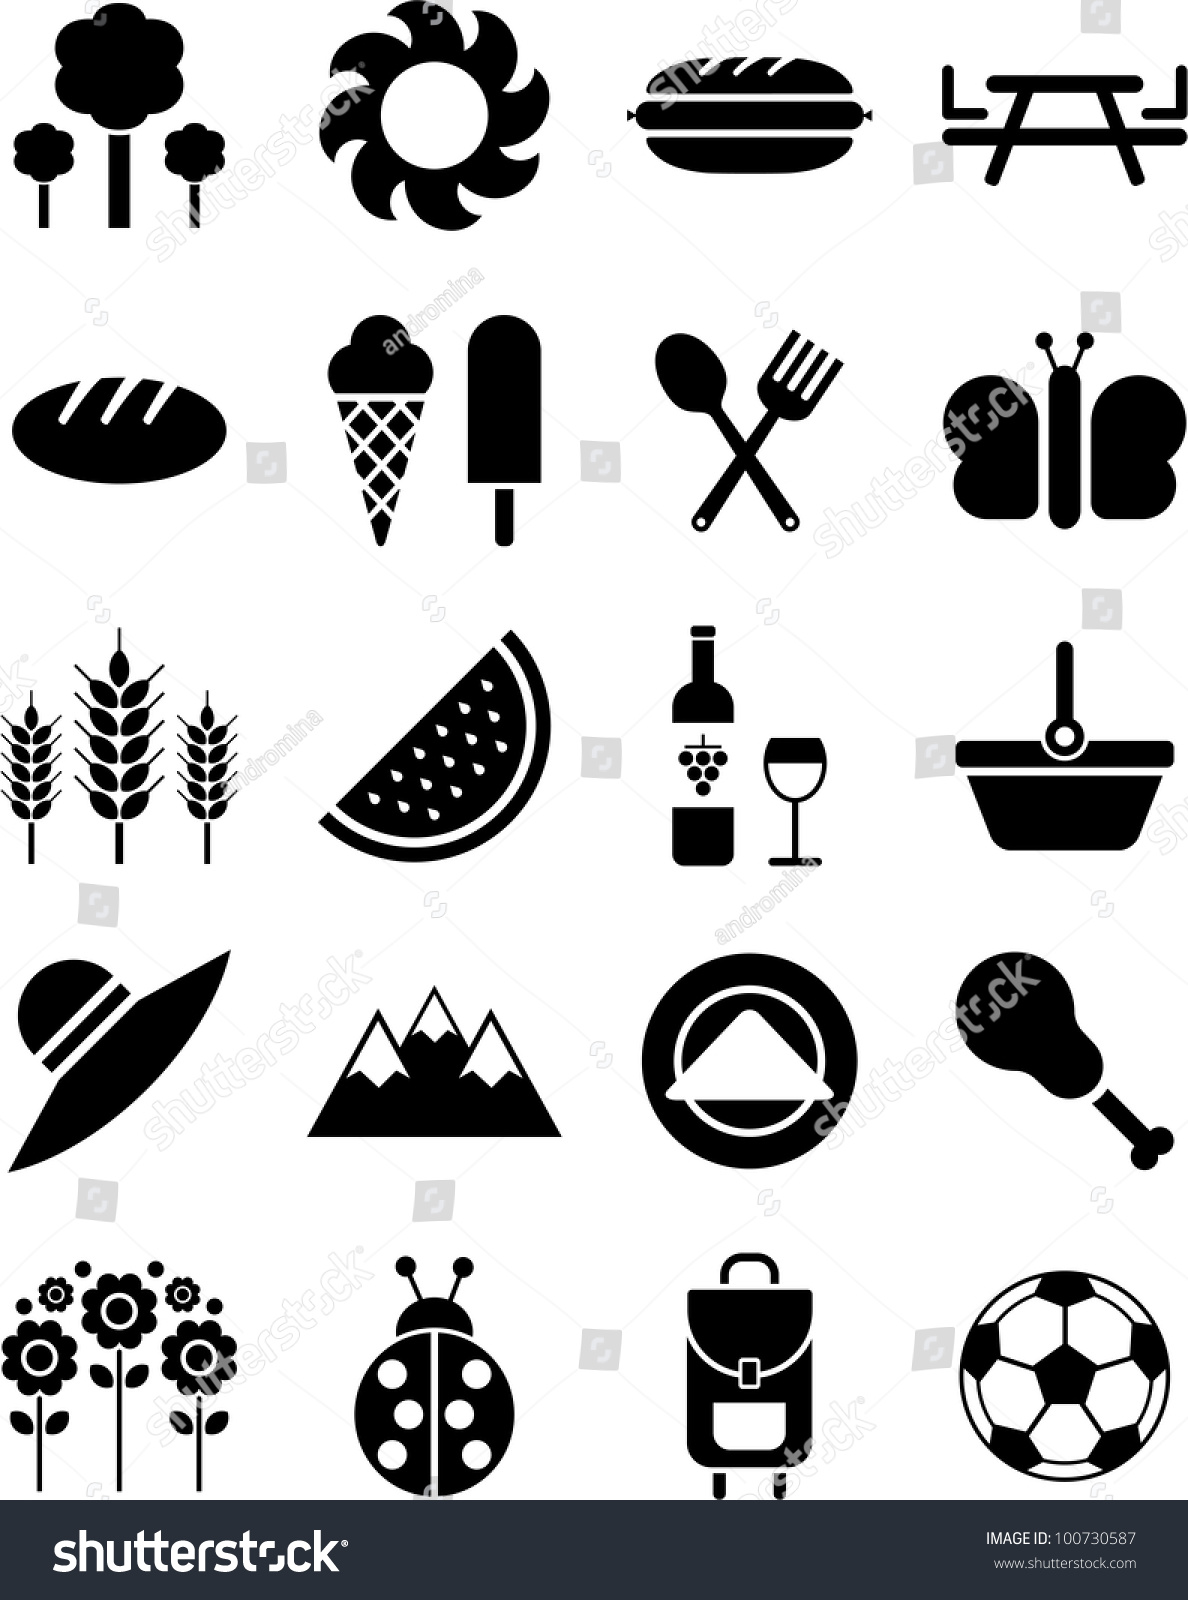 picnic icons stockvektorgrafik 100730587 shutterstock